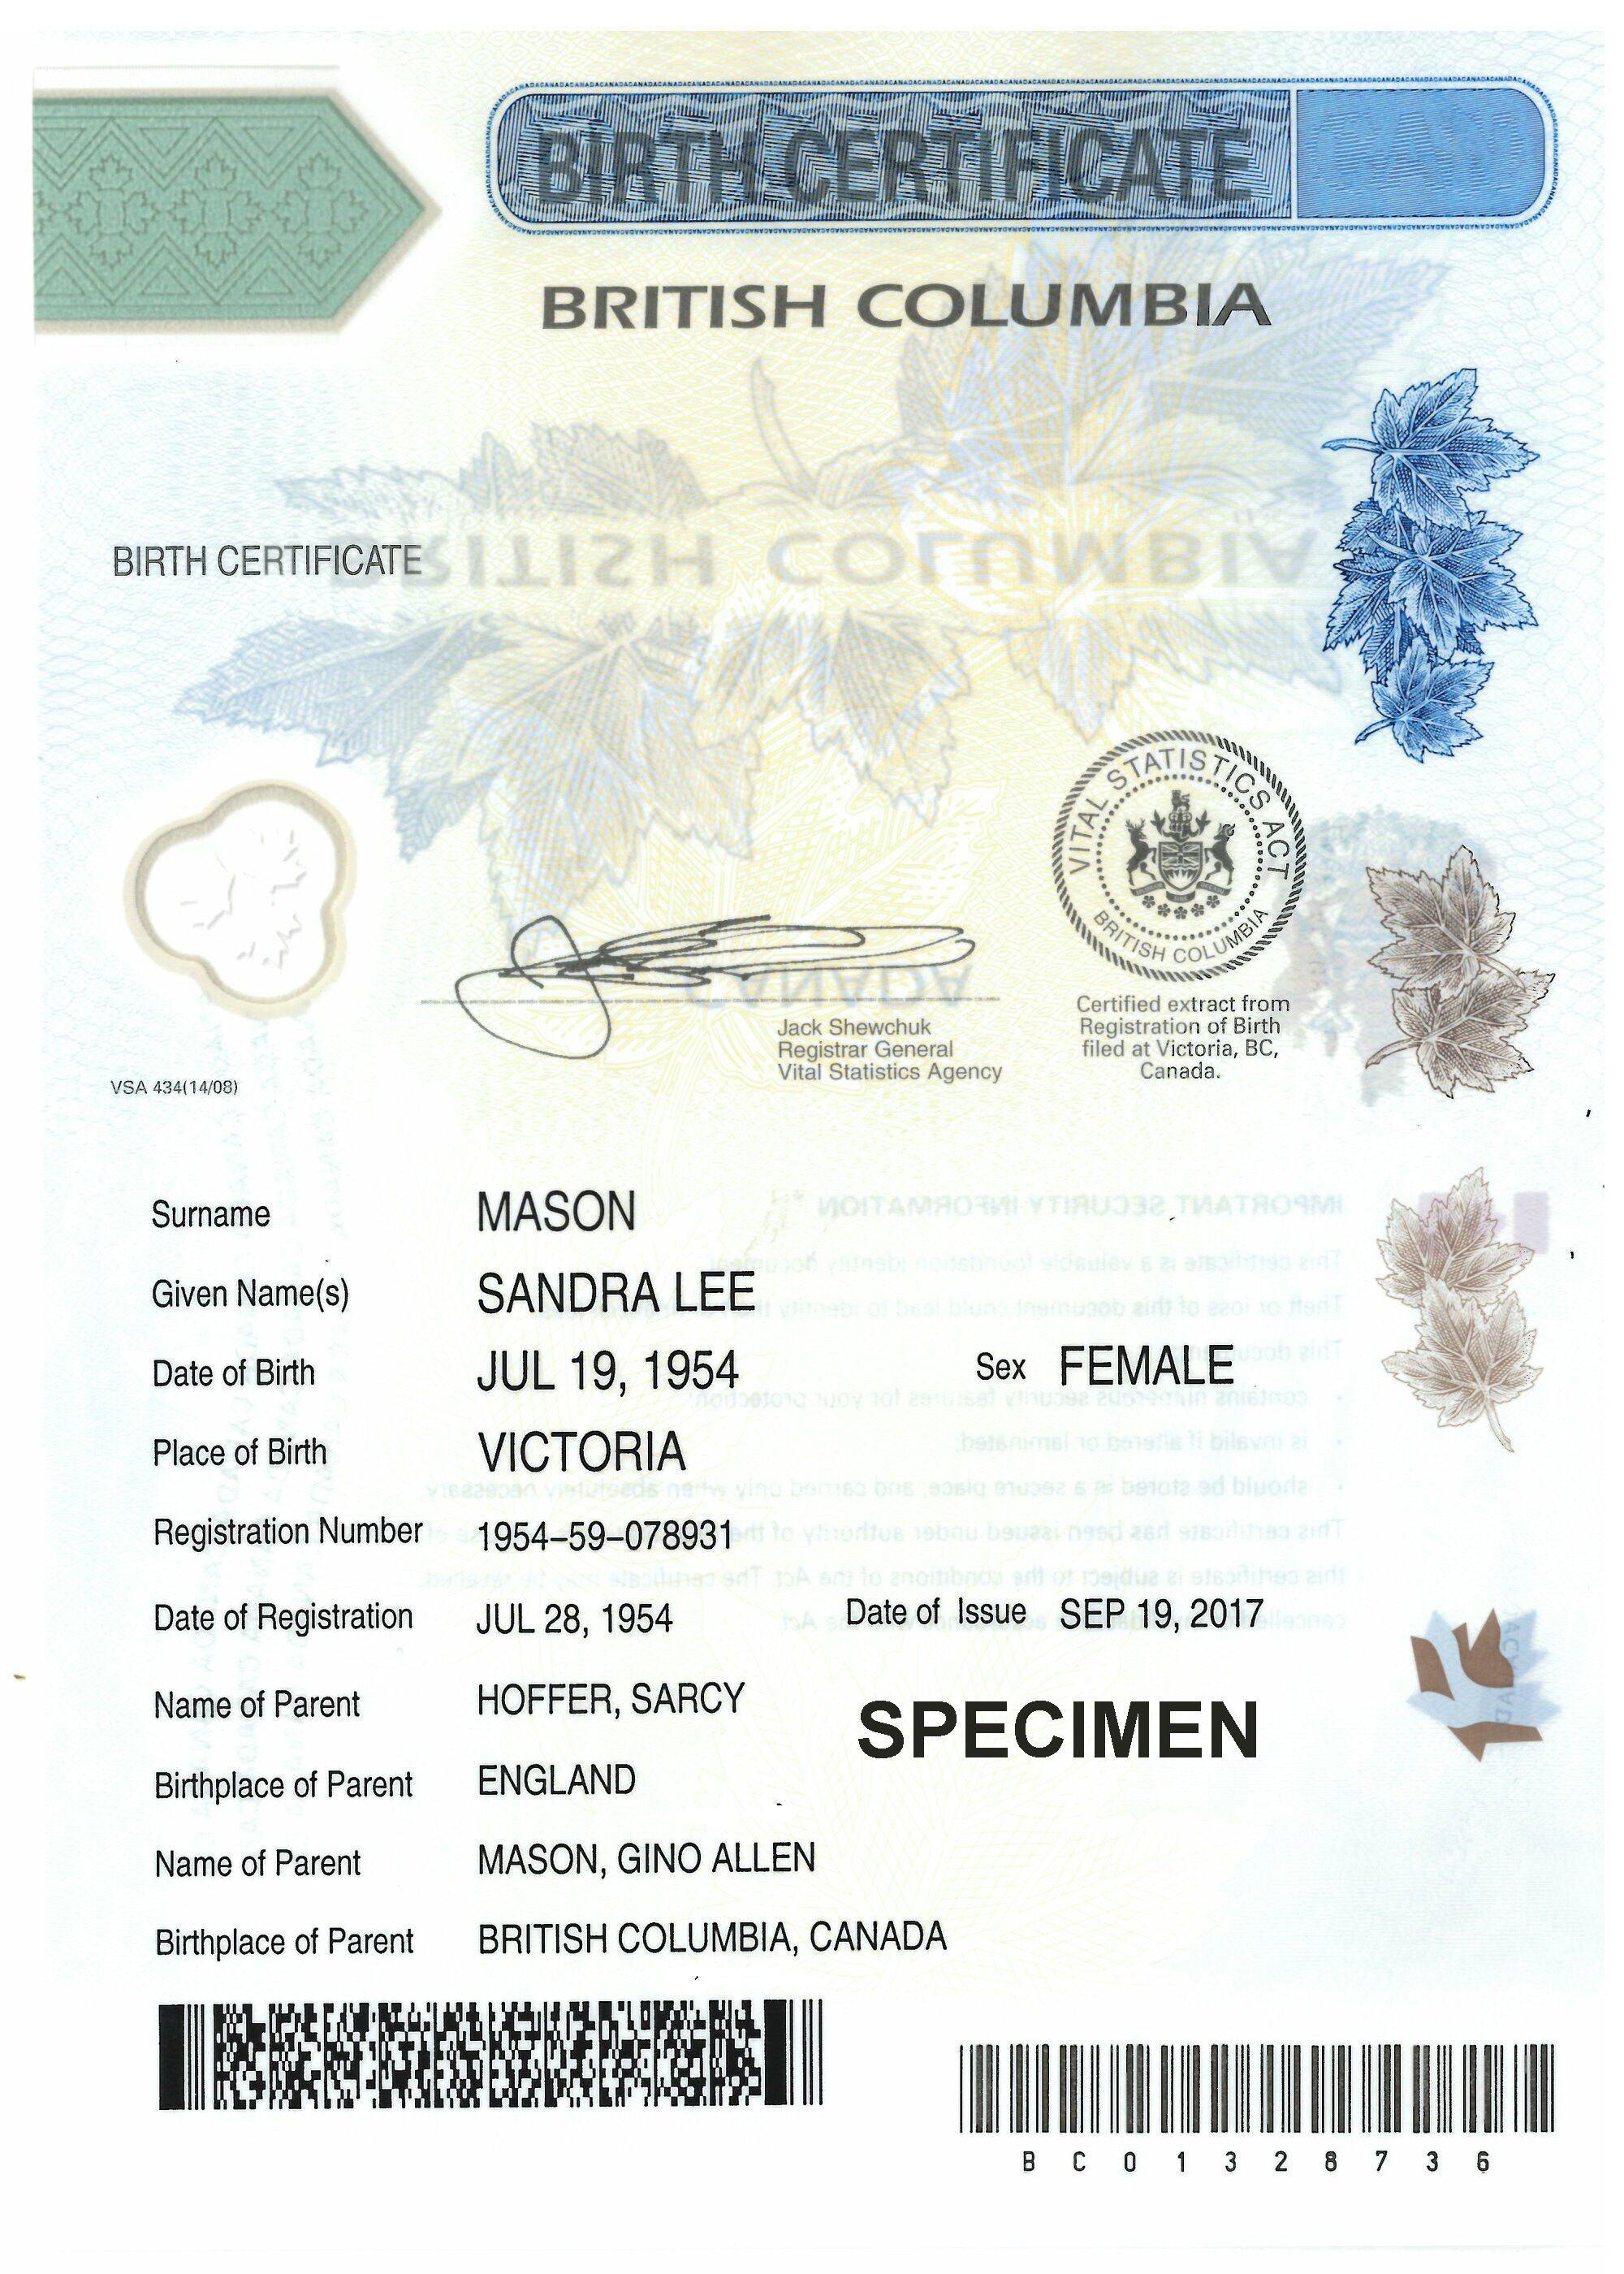 Picture of nova scotia marriage certificate records marriage nova scotia marriage certificate records aiddatafo Gallery